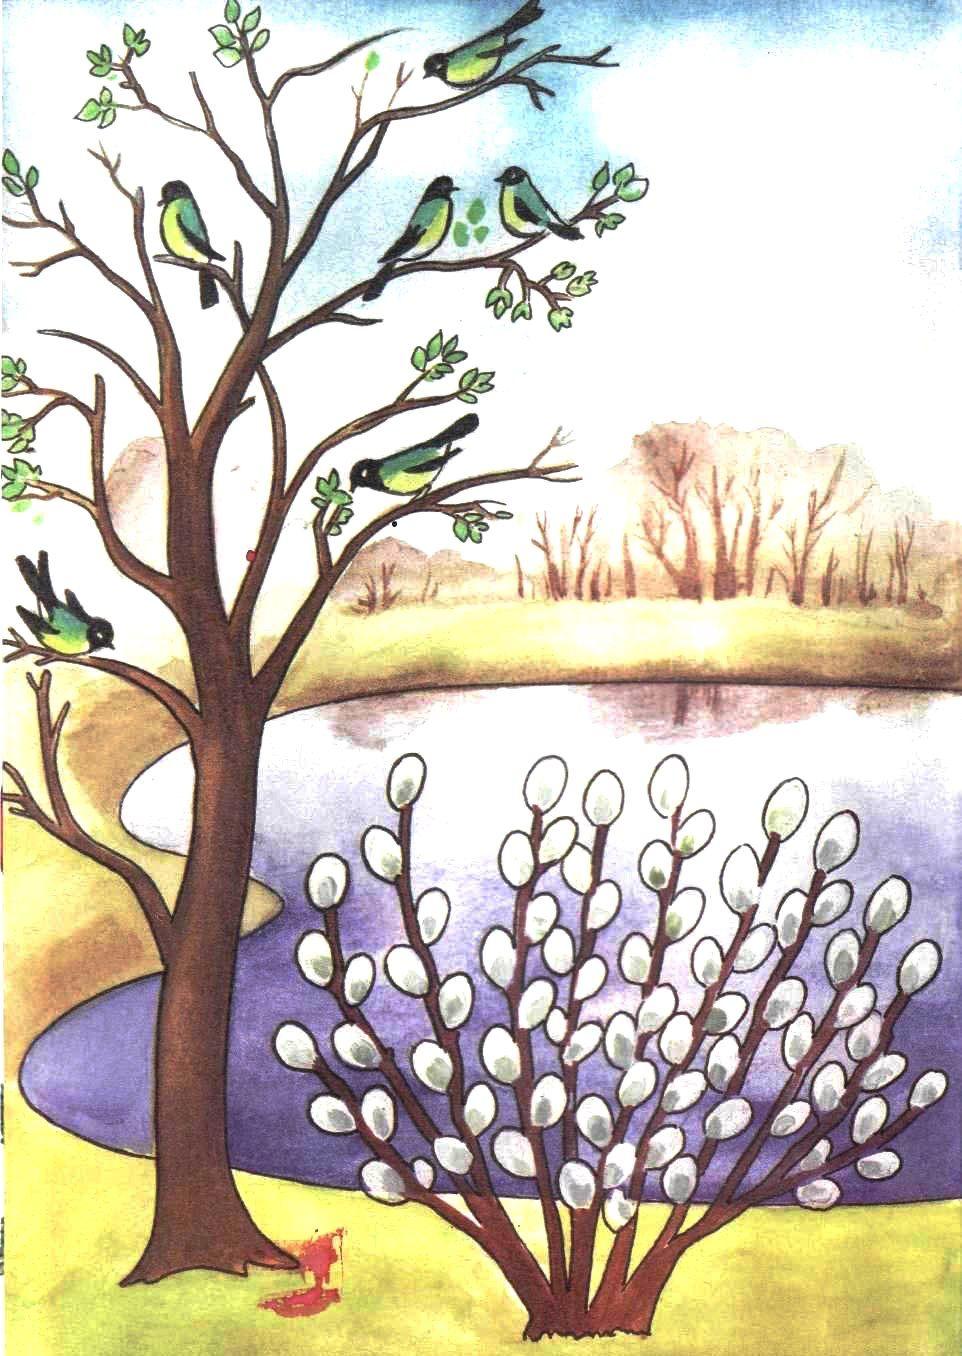 картинки для детей весна пришла | Рисунки, Раскраски ...